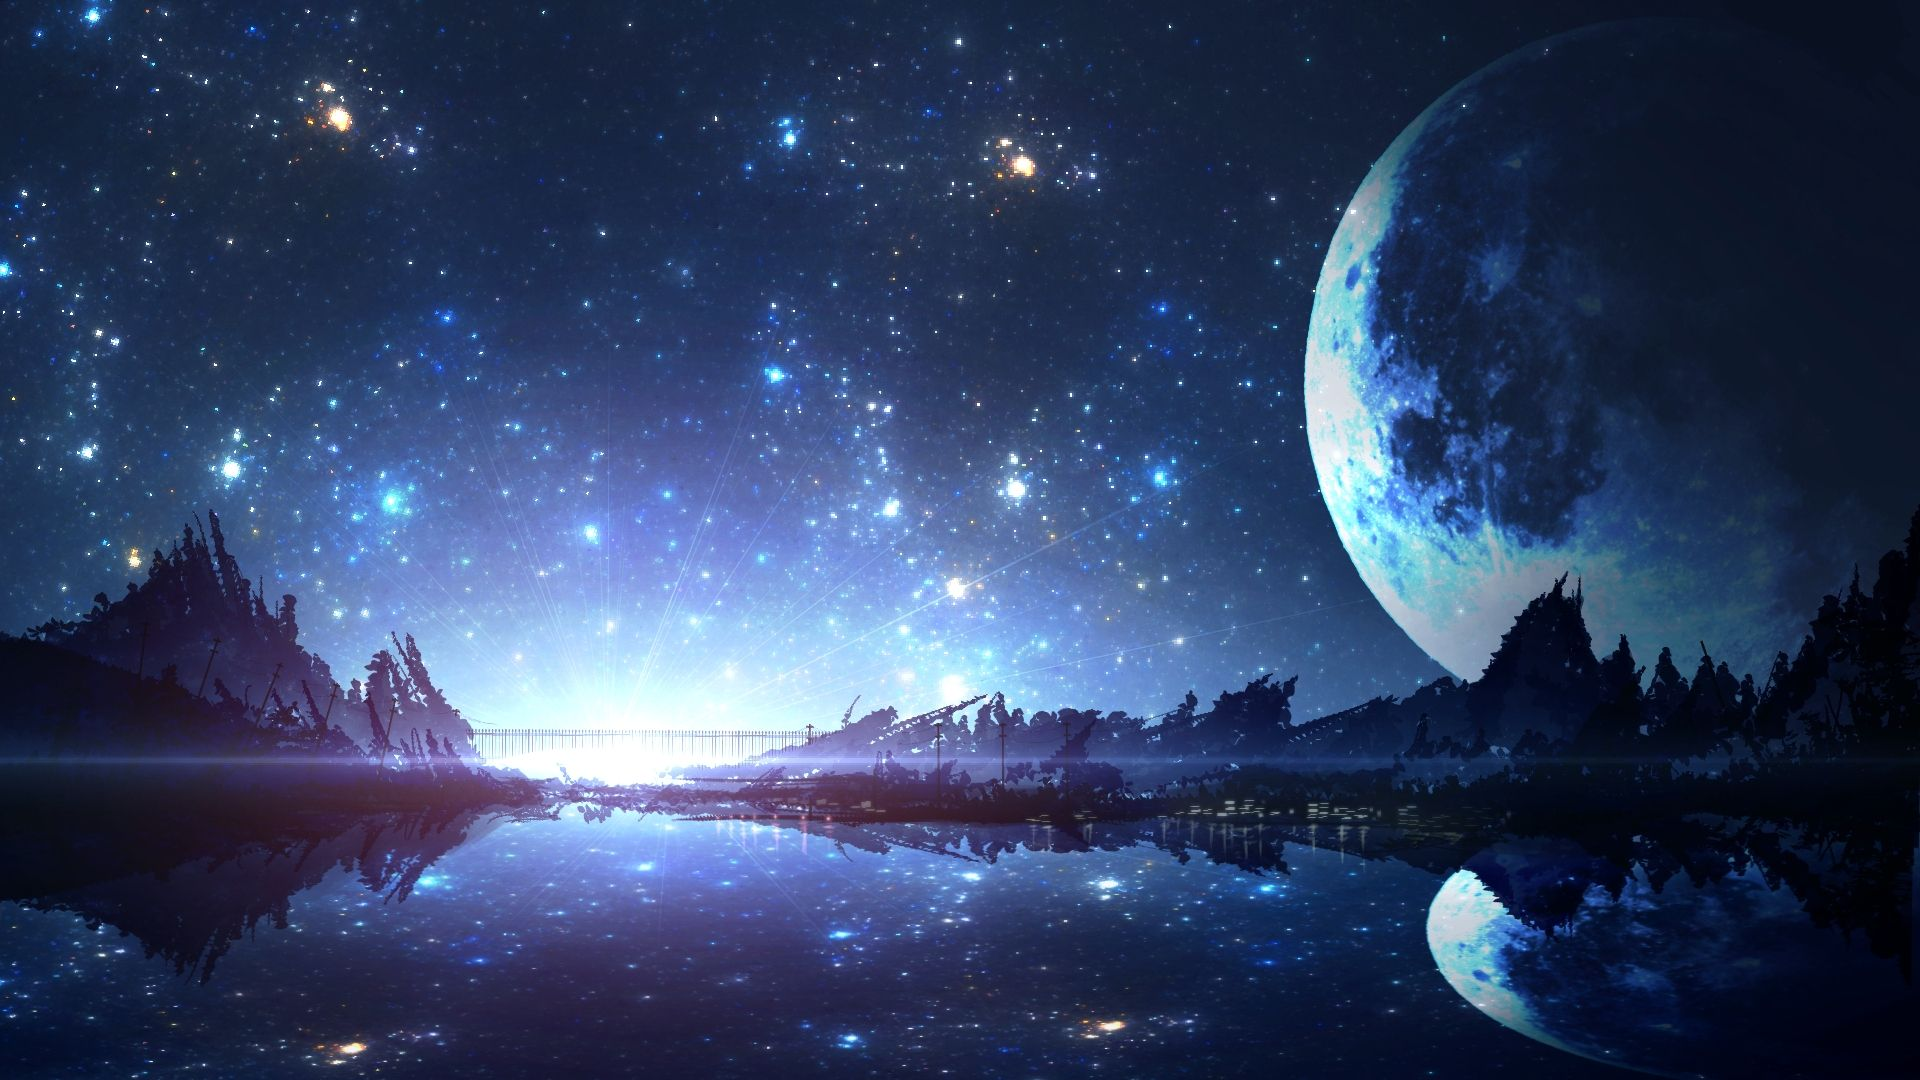 Fantasy Landscape Moon Reflection River Artwork Stars Painting Fantasy Landscape Fantasy Art Landscapes Anime Wallpaper